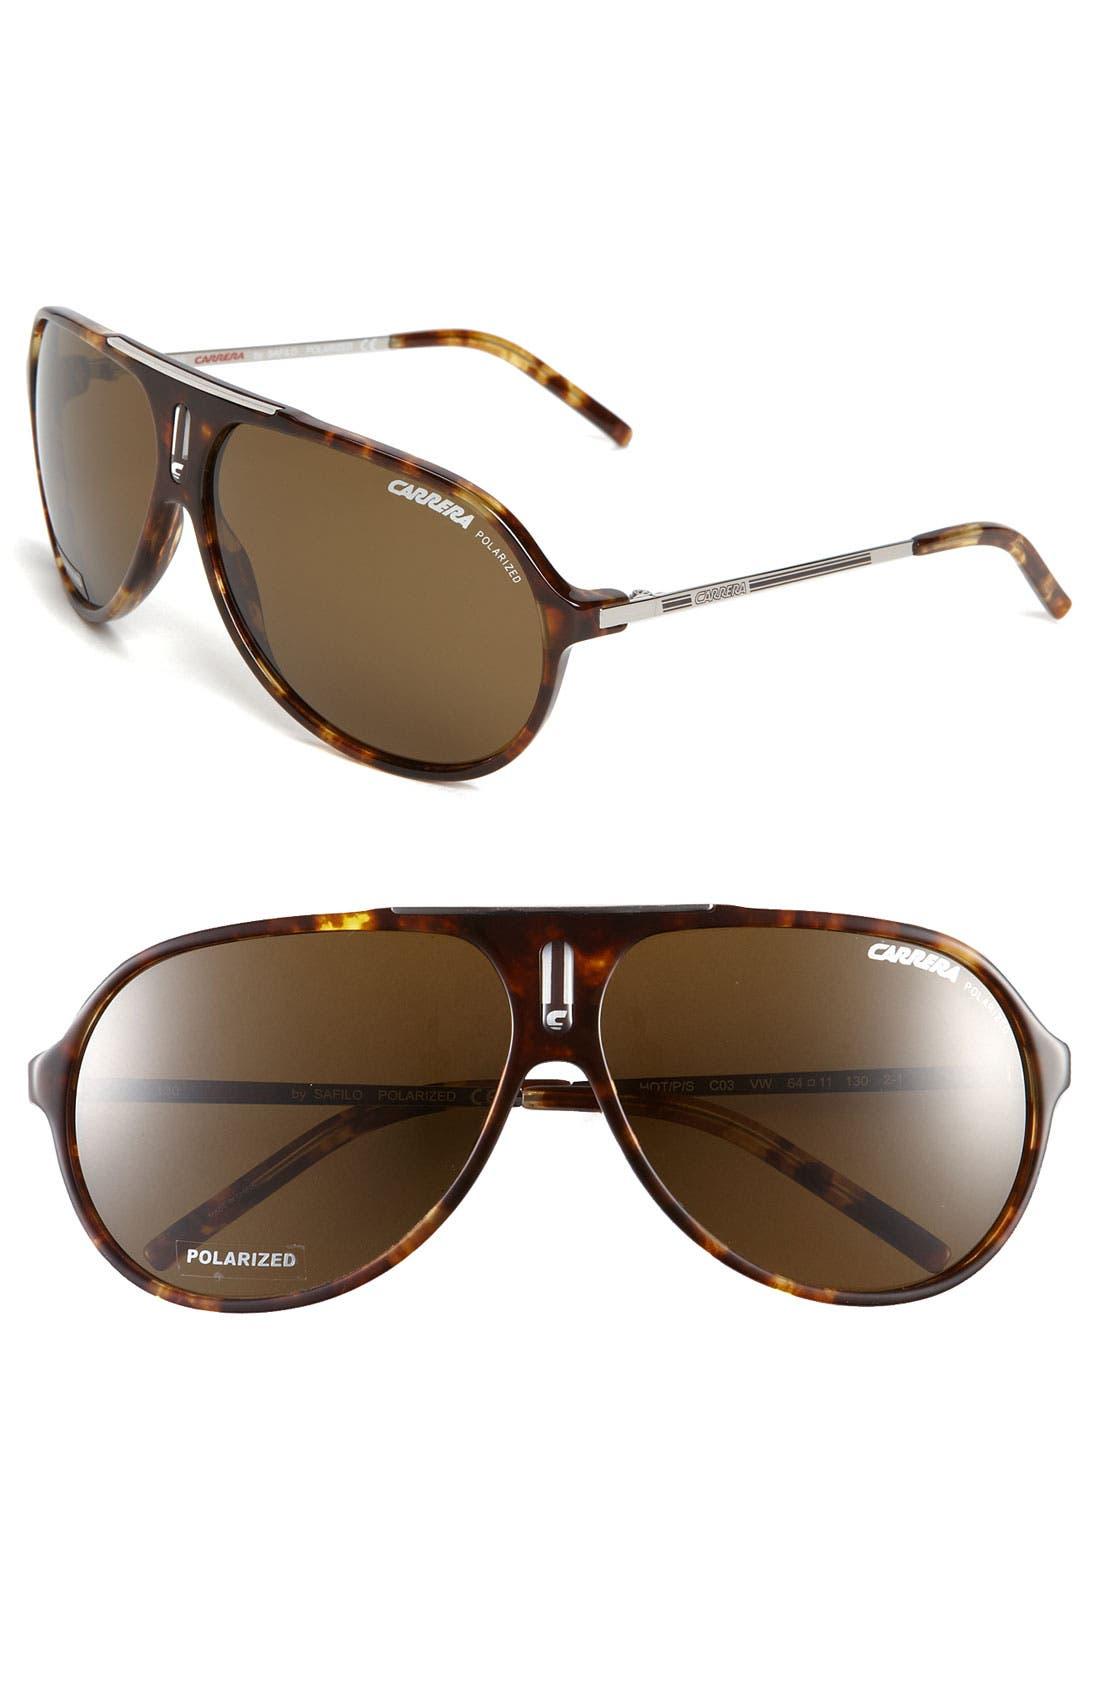 Alternate Image 1 Selected - Carrera Eyewear 'Hot' 64mm Polarized Aviator Sunglasses